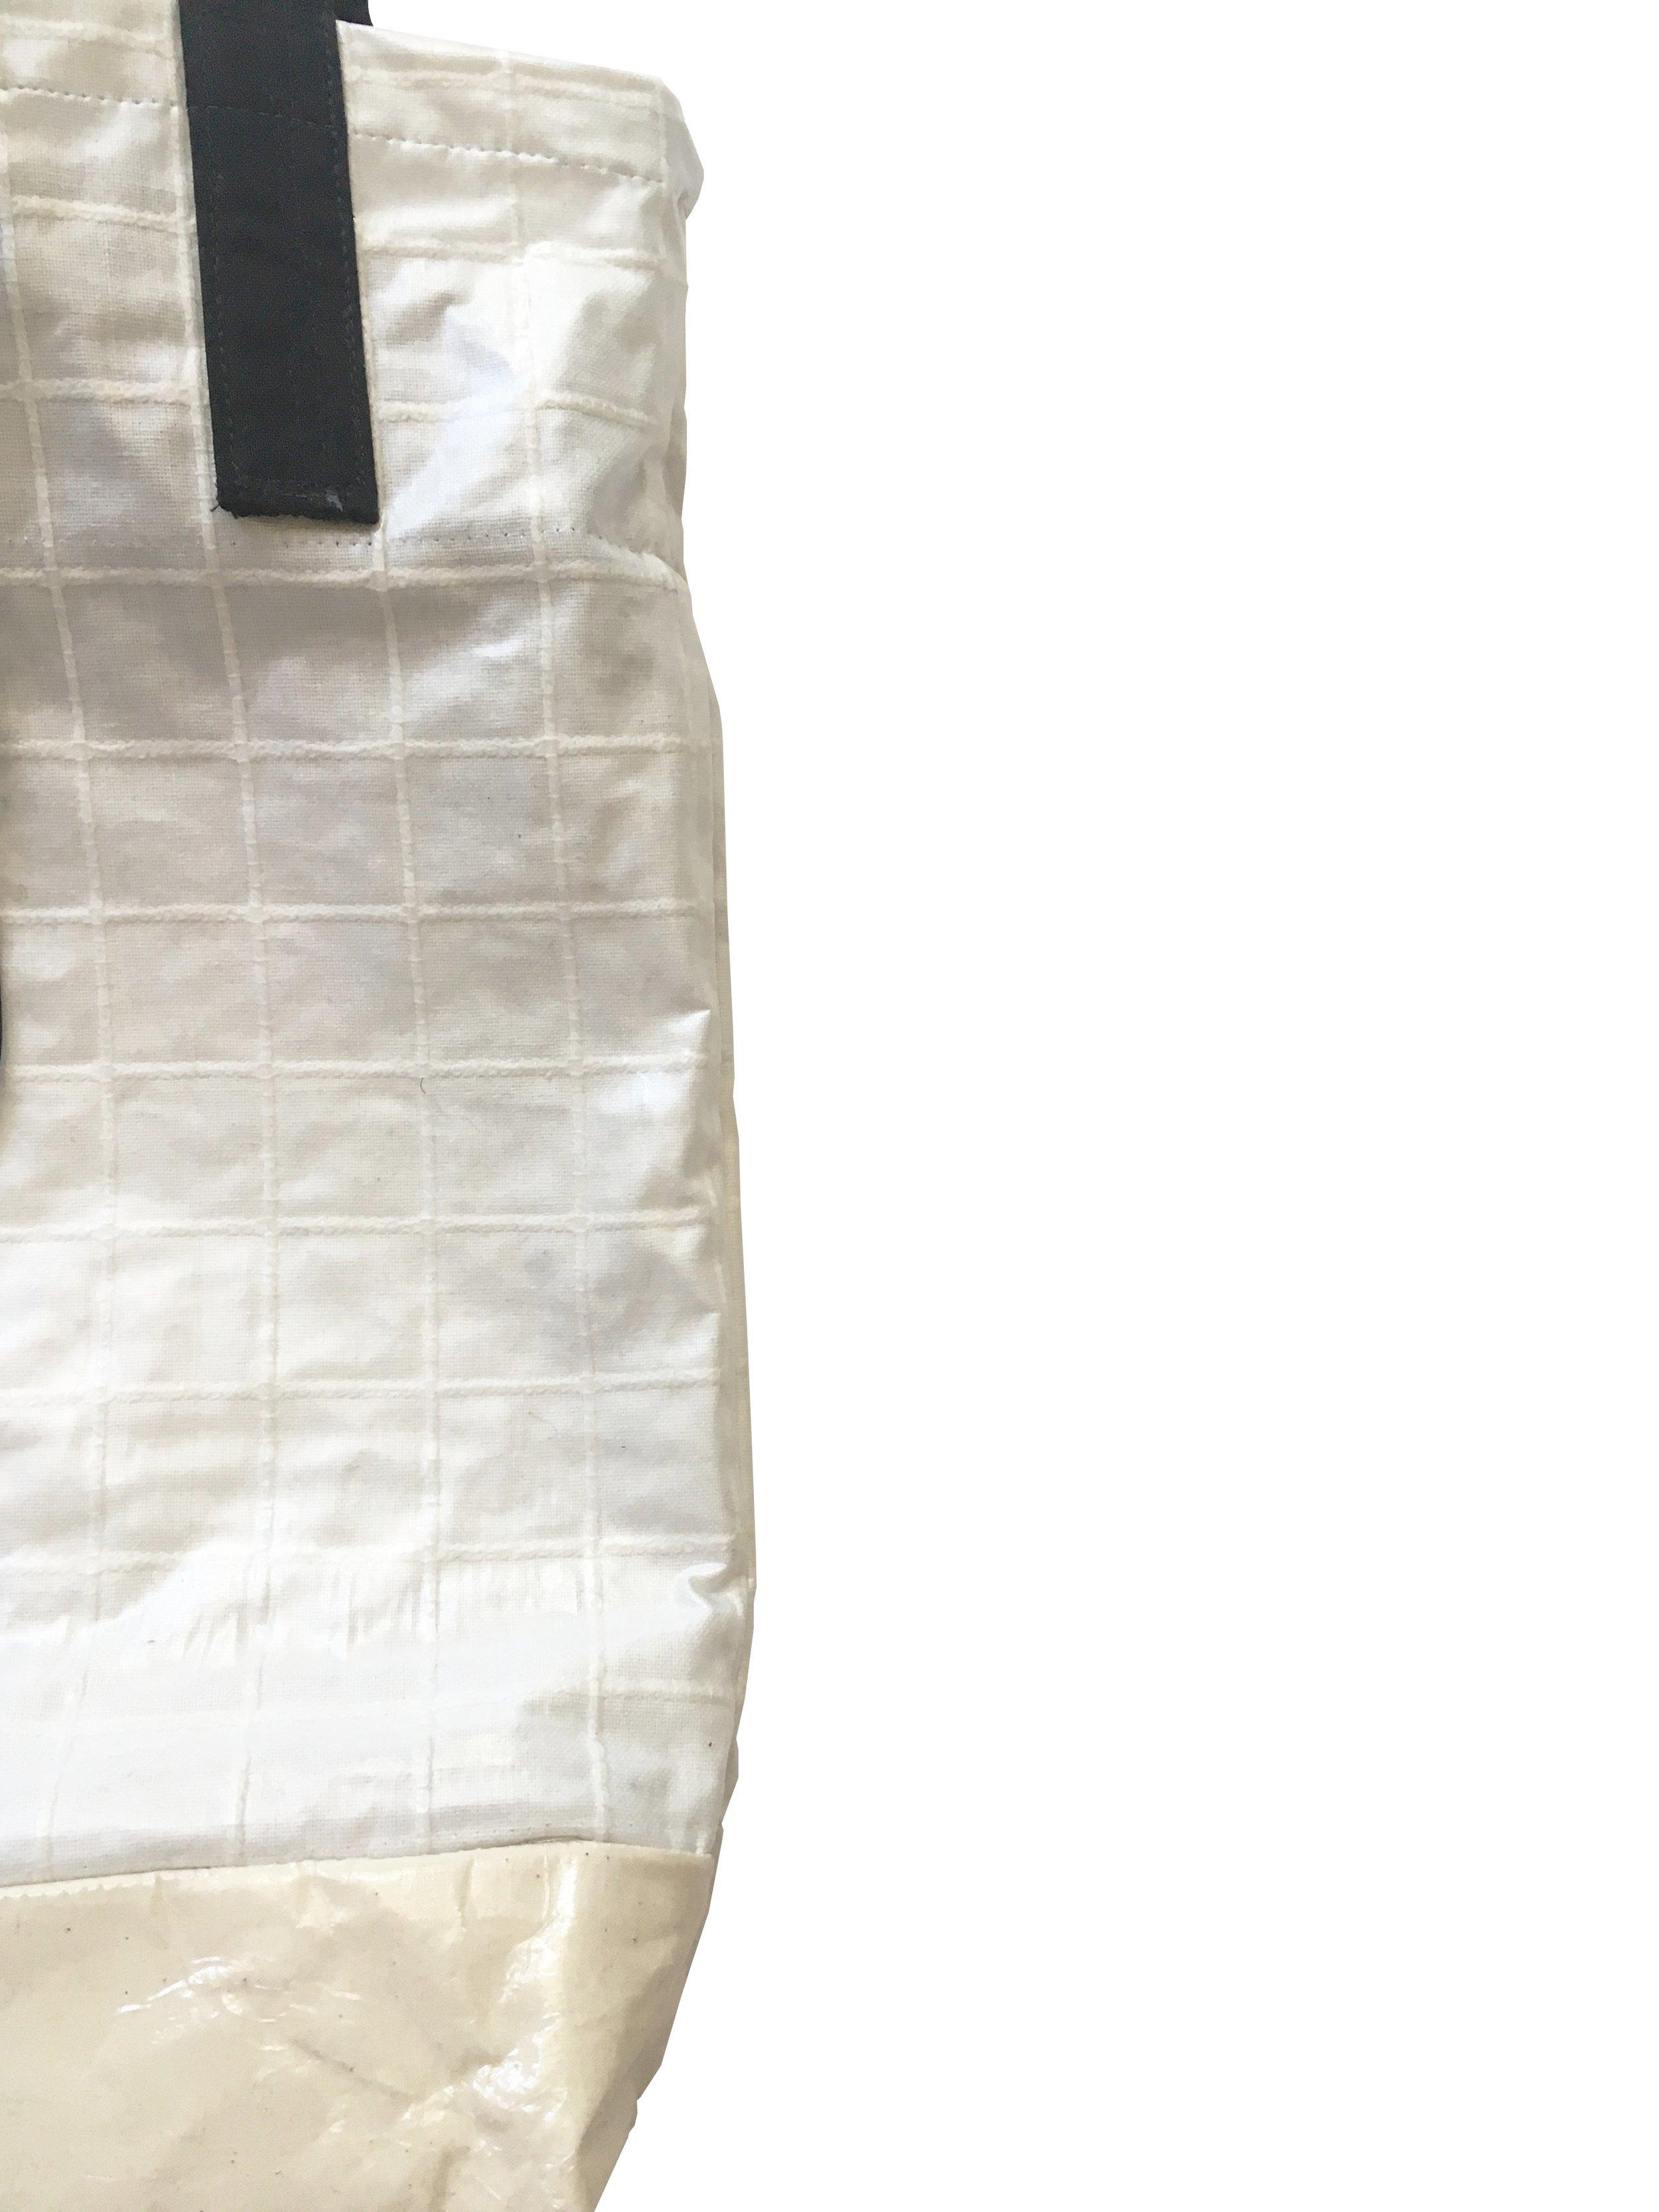 Backpack5(2).jpg